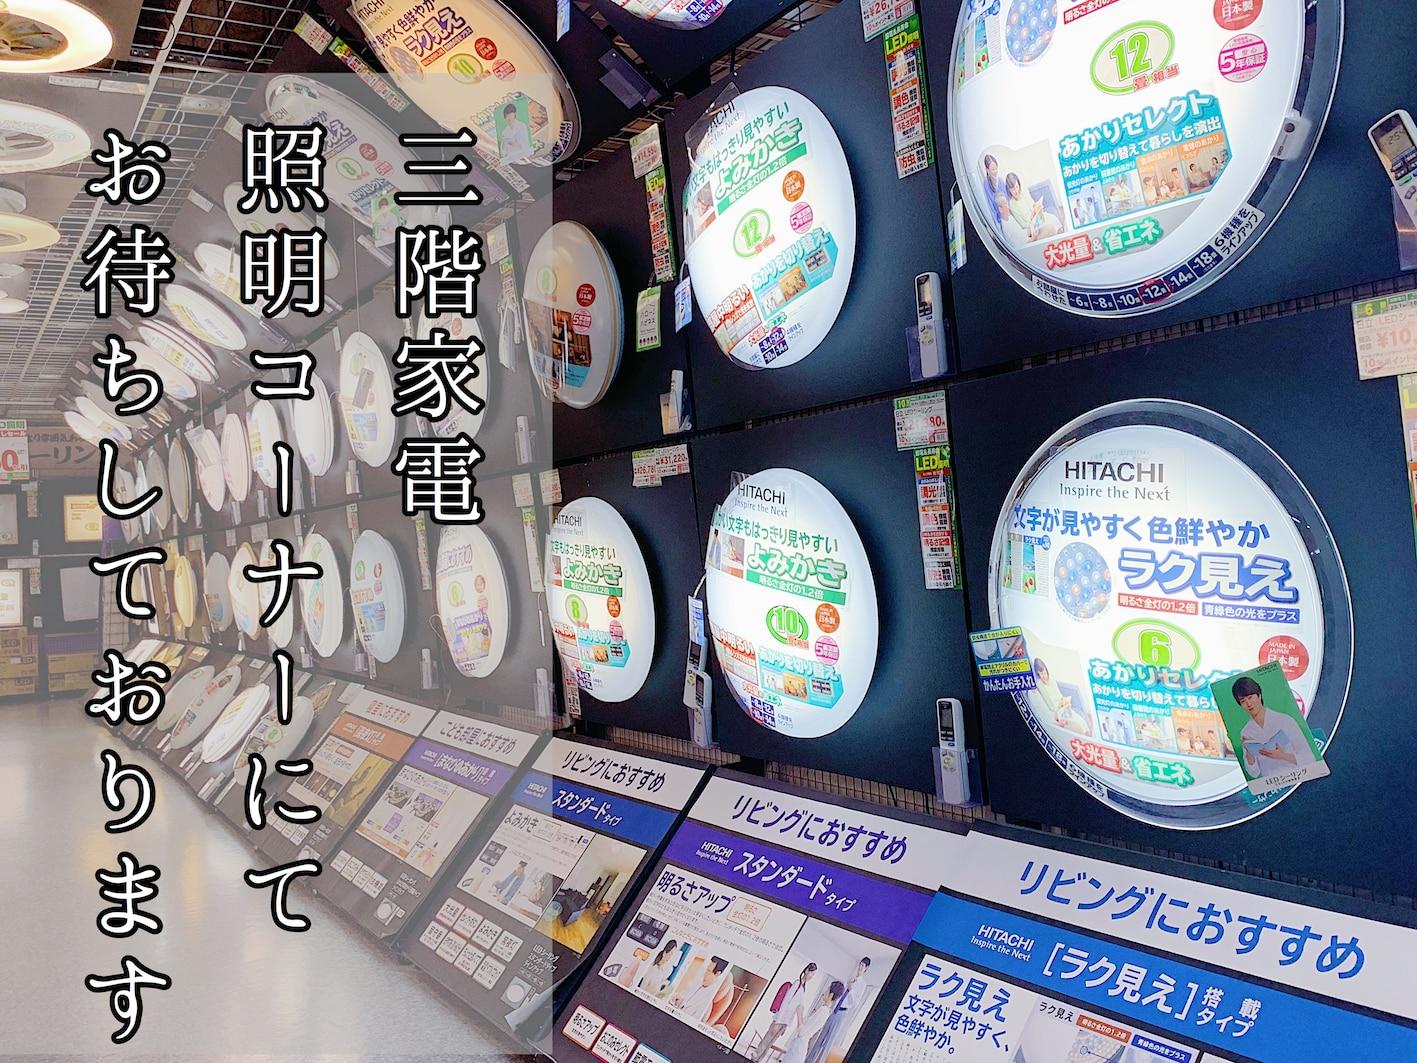 http://image.yodobashi.com/promotion/a/11843/200000017500068021/SD_200000017500068021510B1.jpg